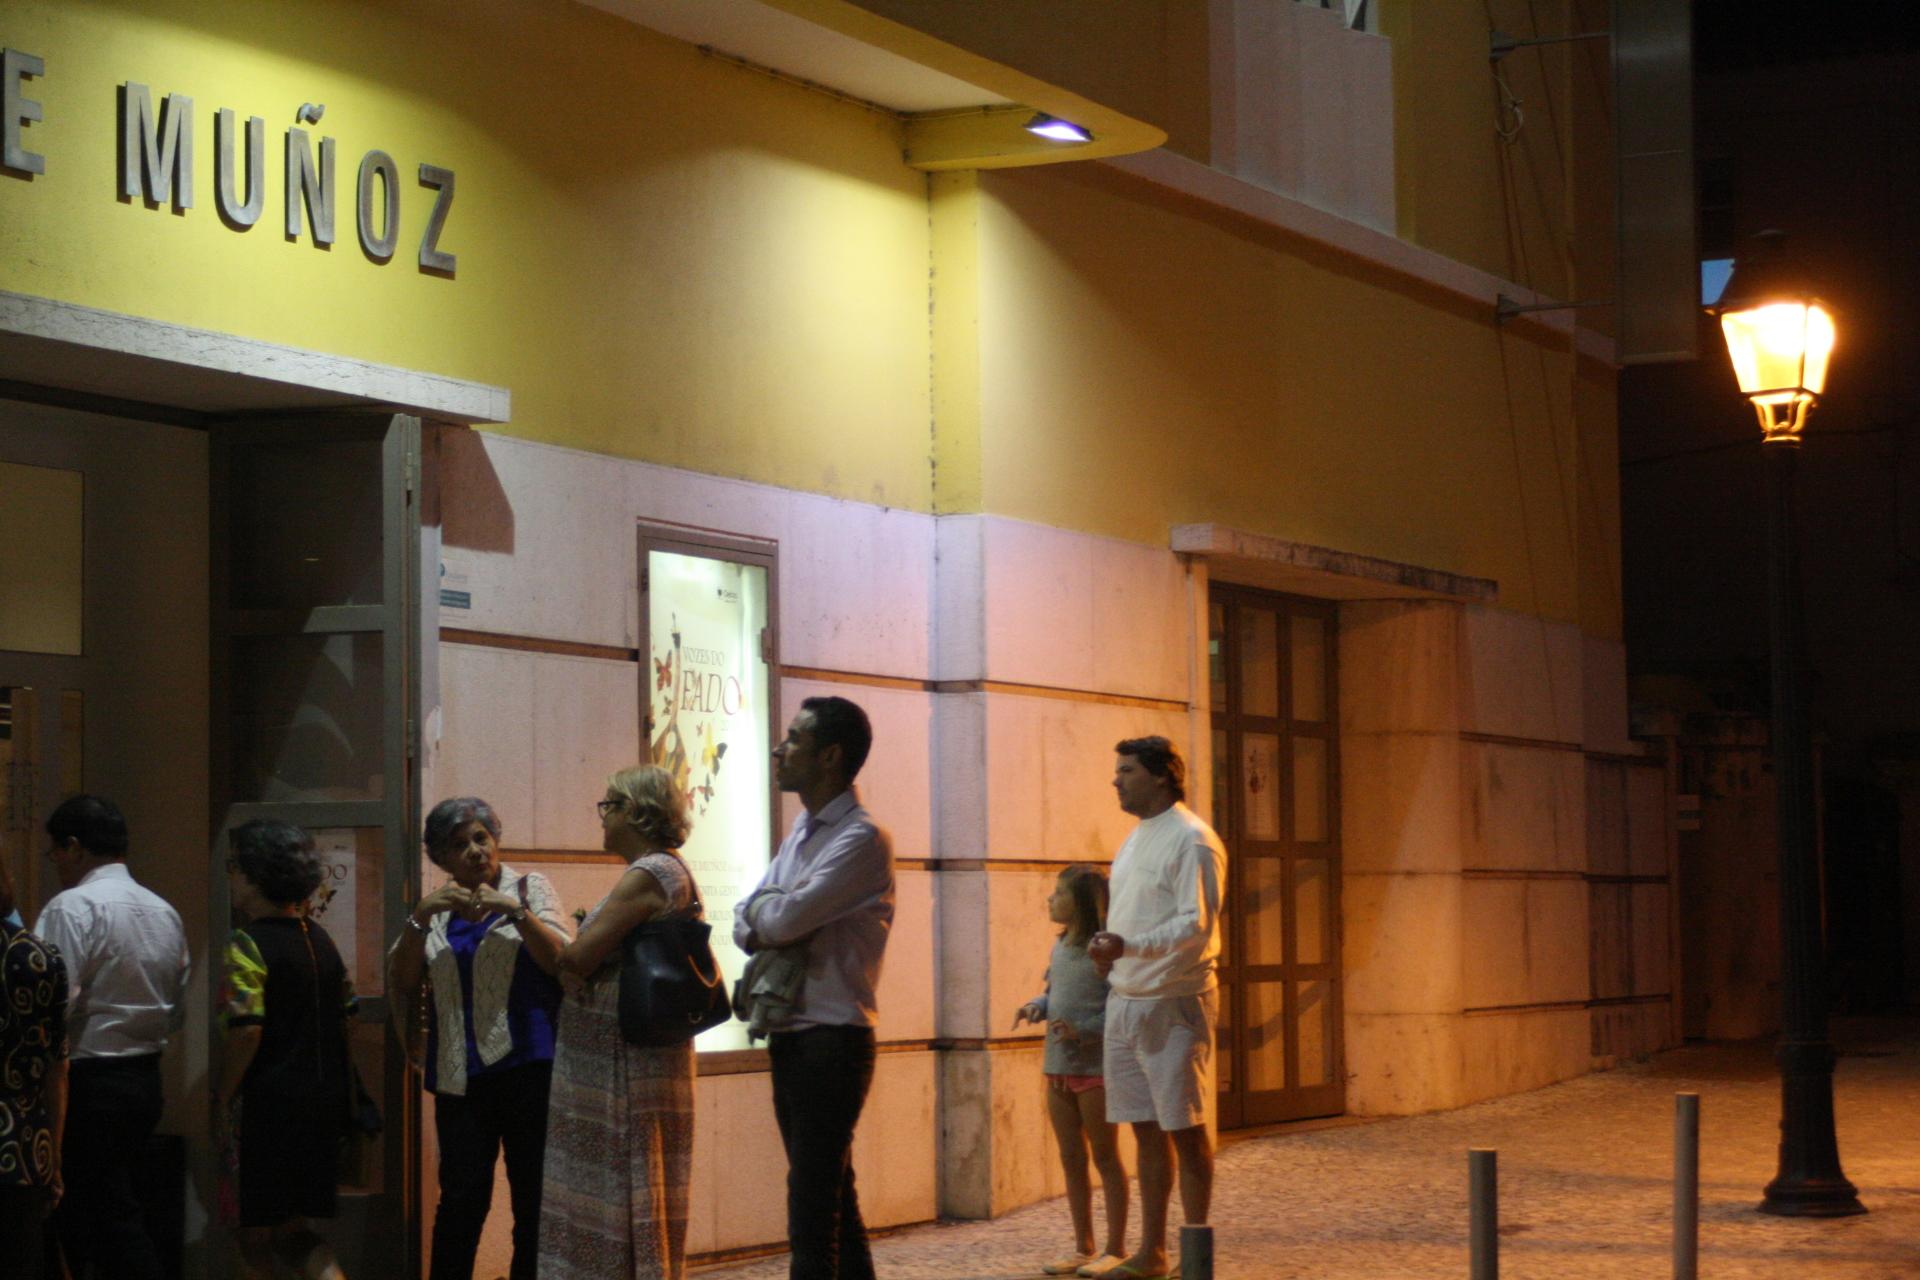 Theater Muñoz in Oeiras